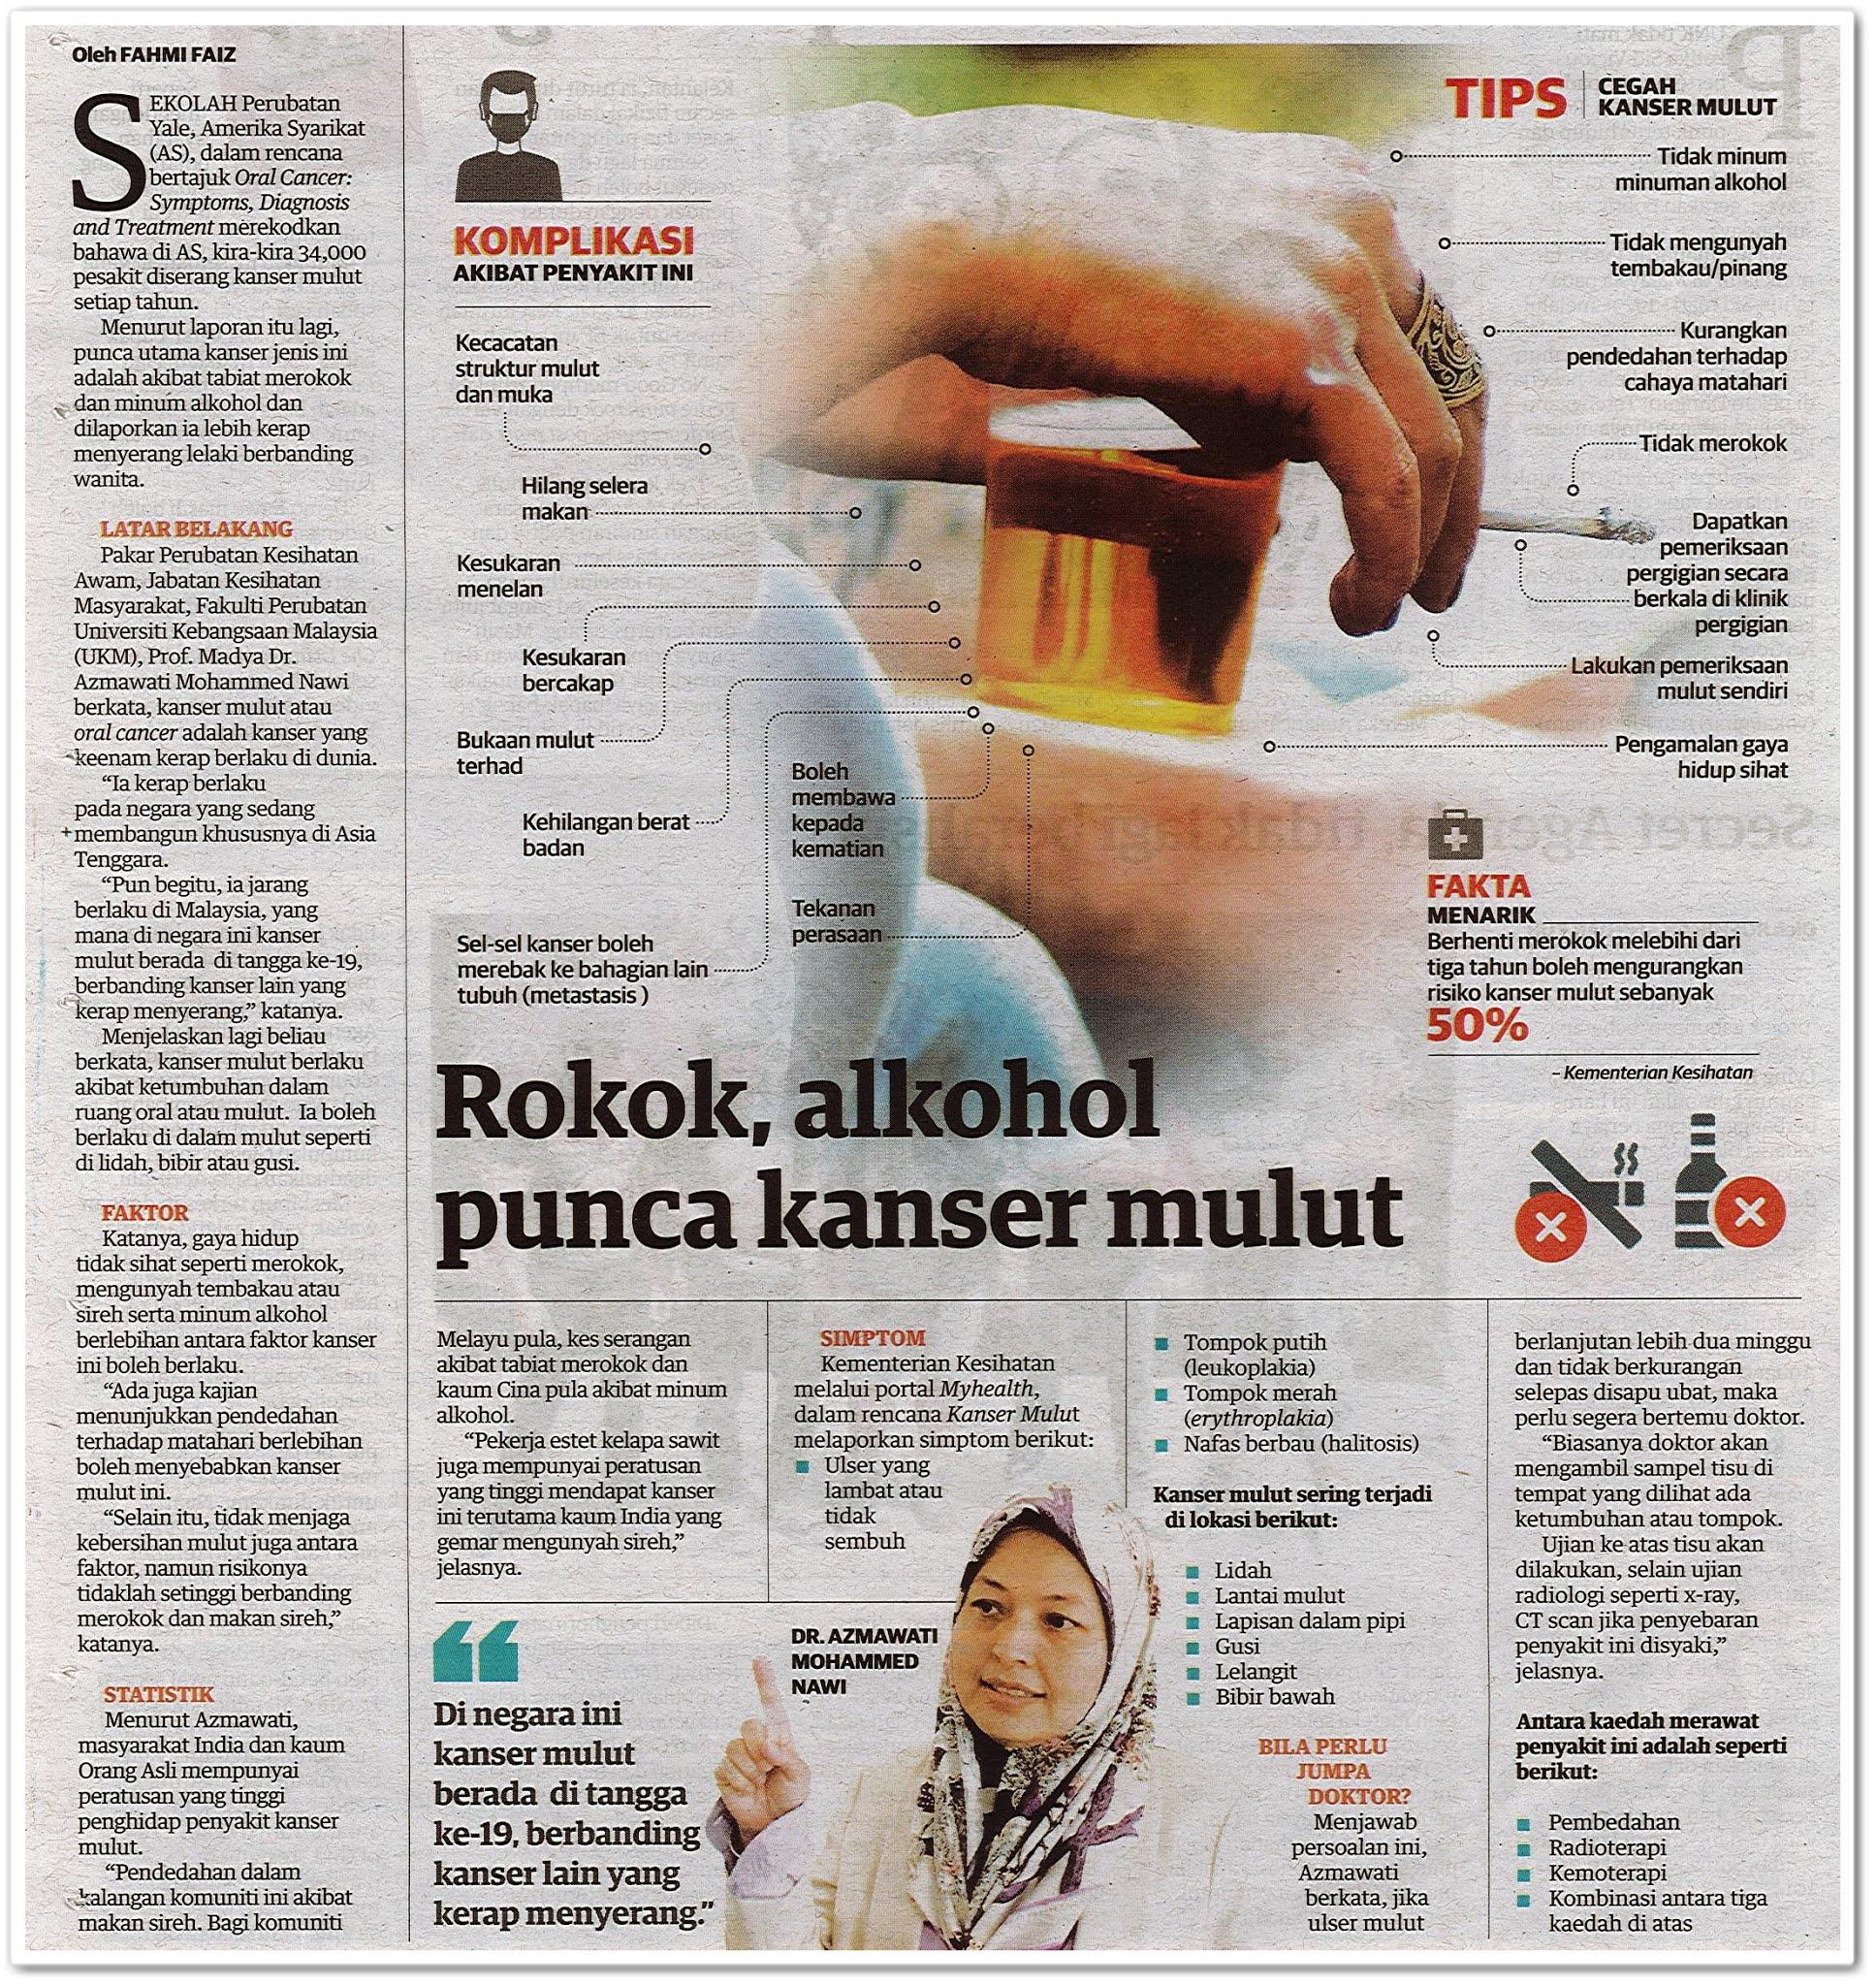 Rokok, alkohol punca kanser mulut